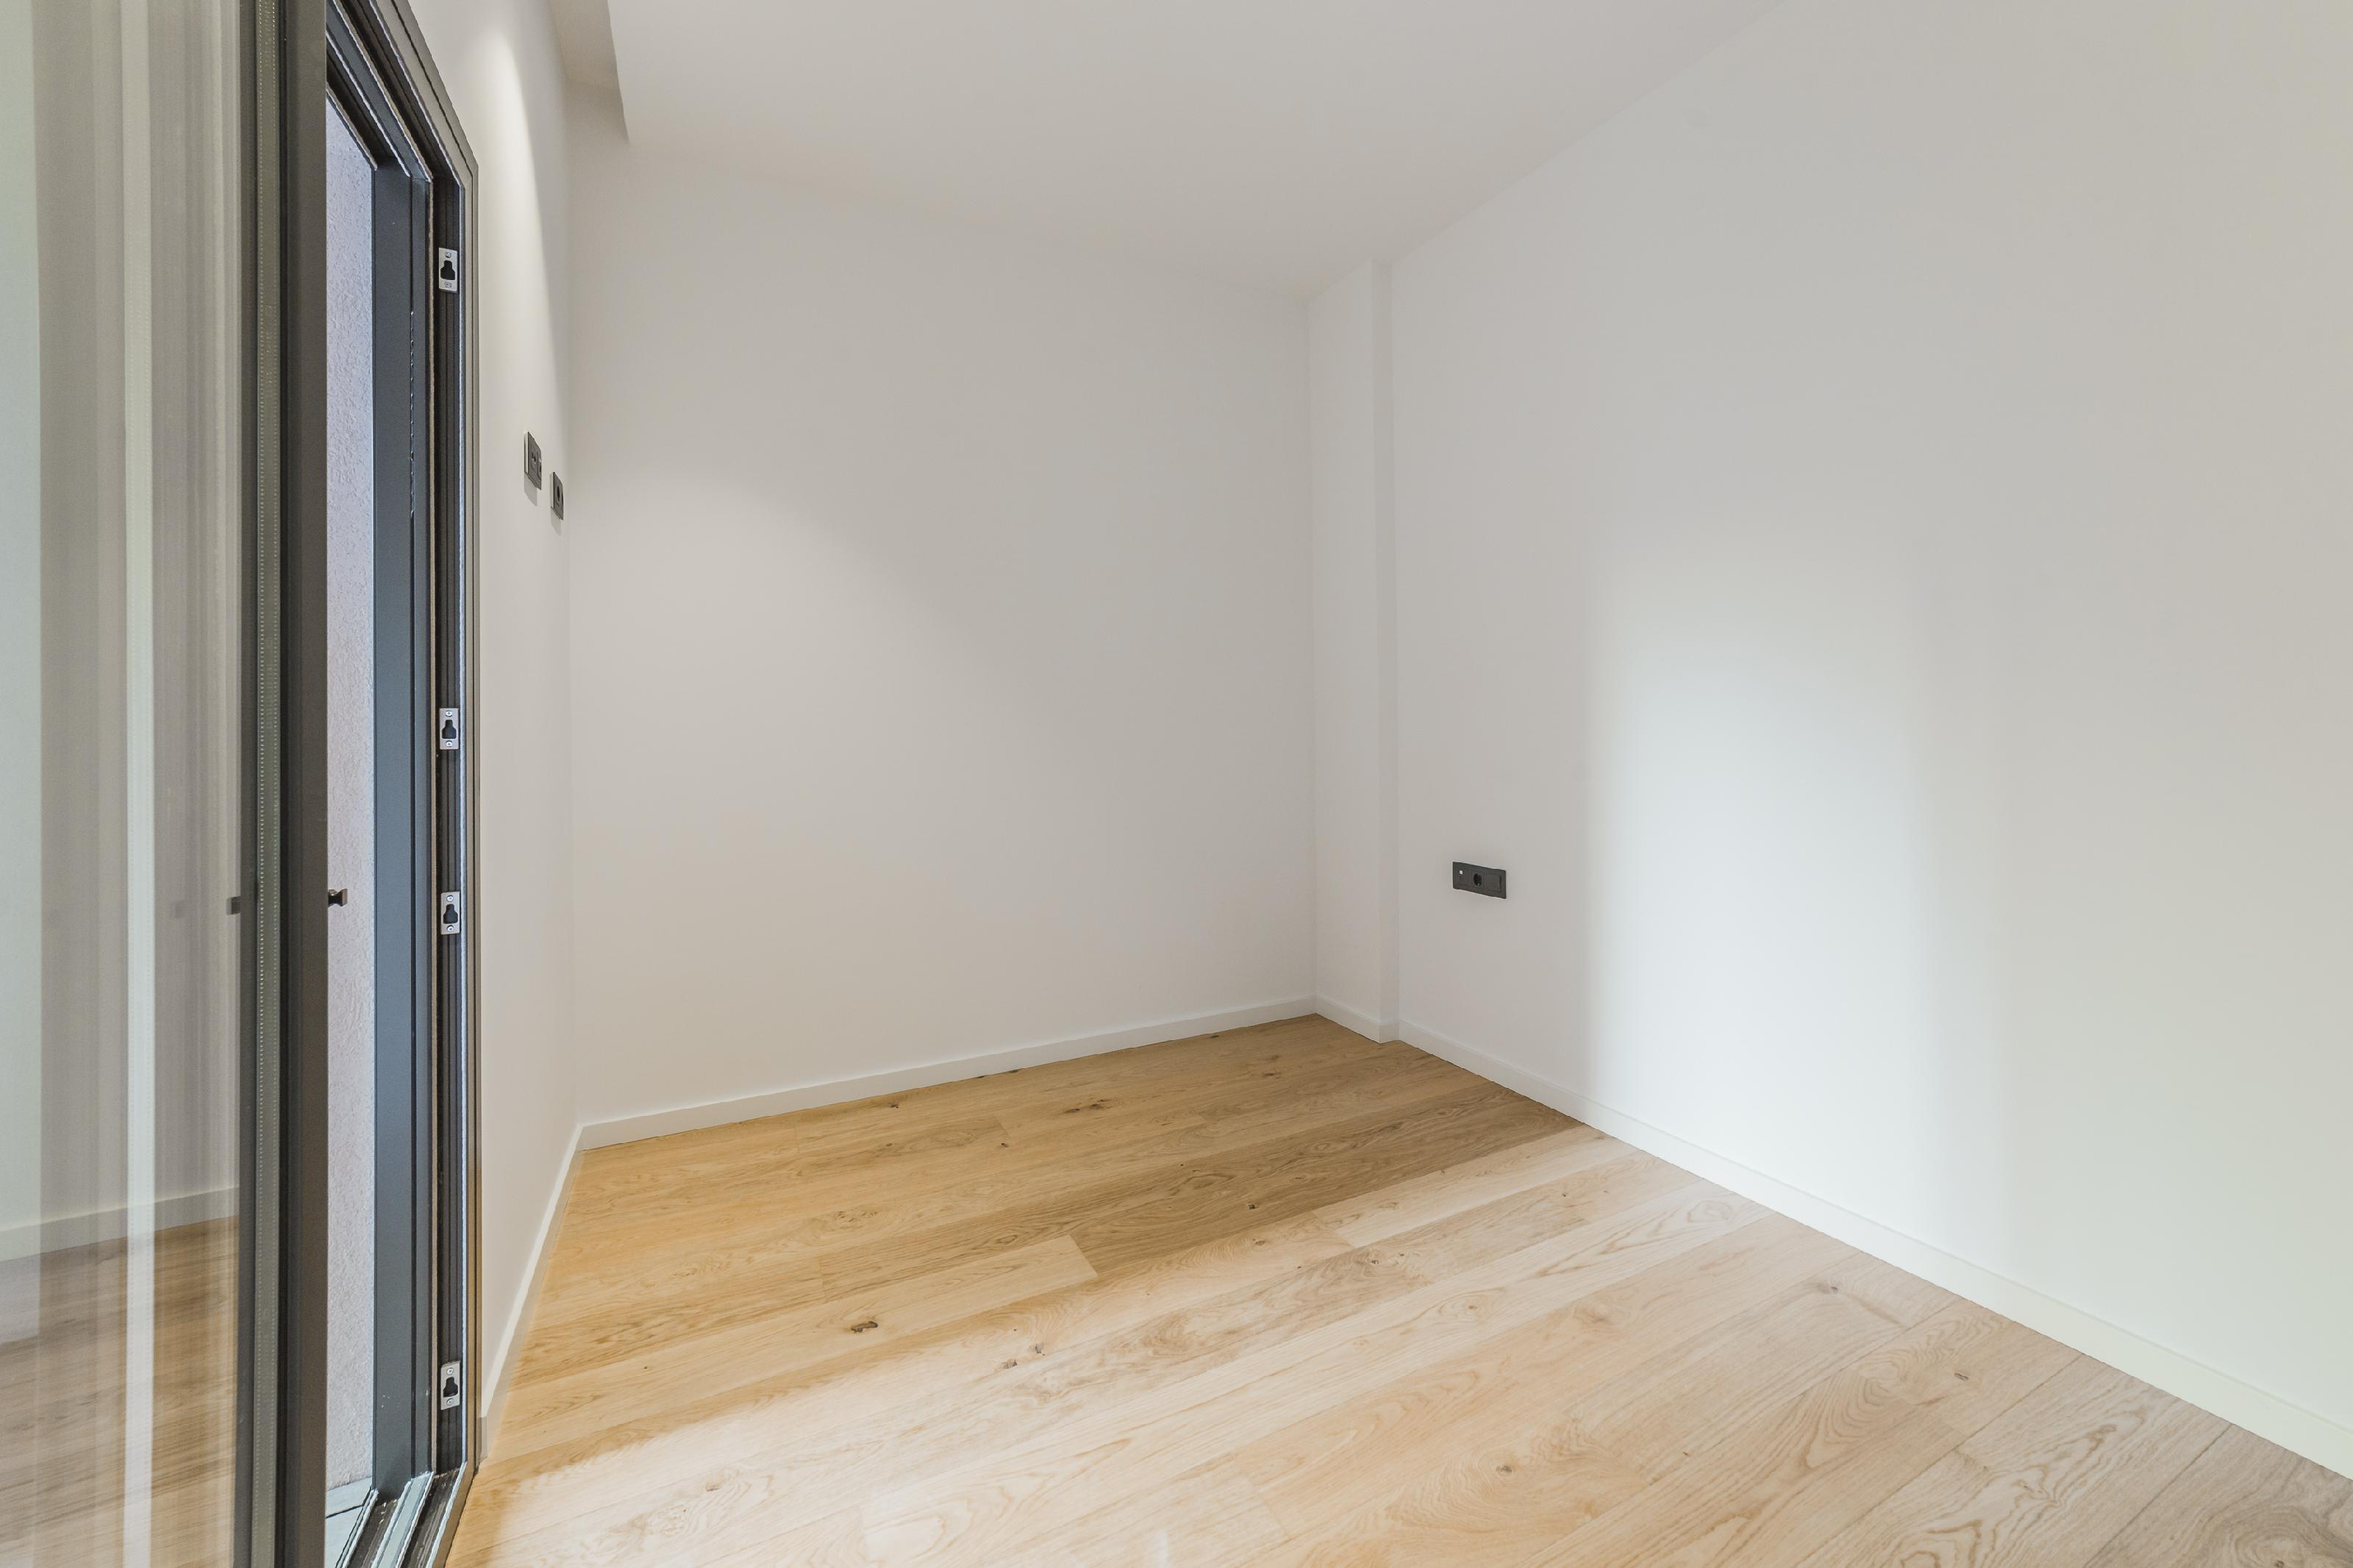 182456 Apartamento en venda en Eixample, Antiga Esquerre Eixample 20